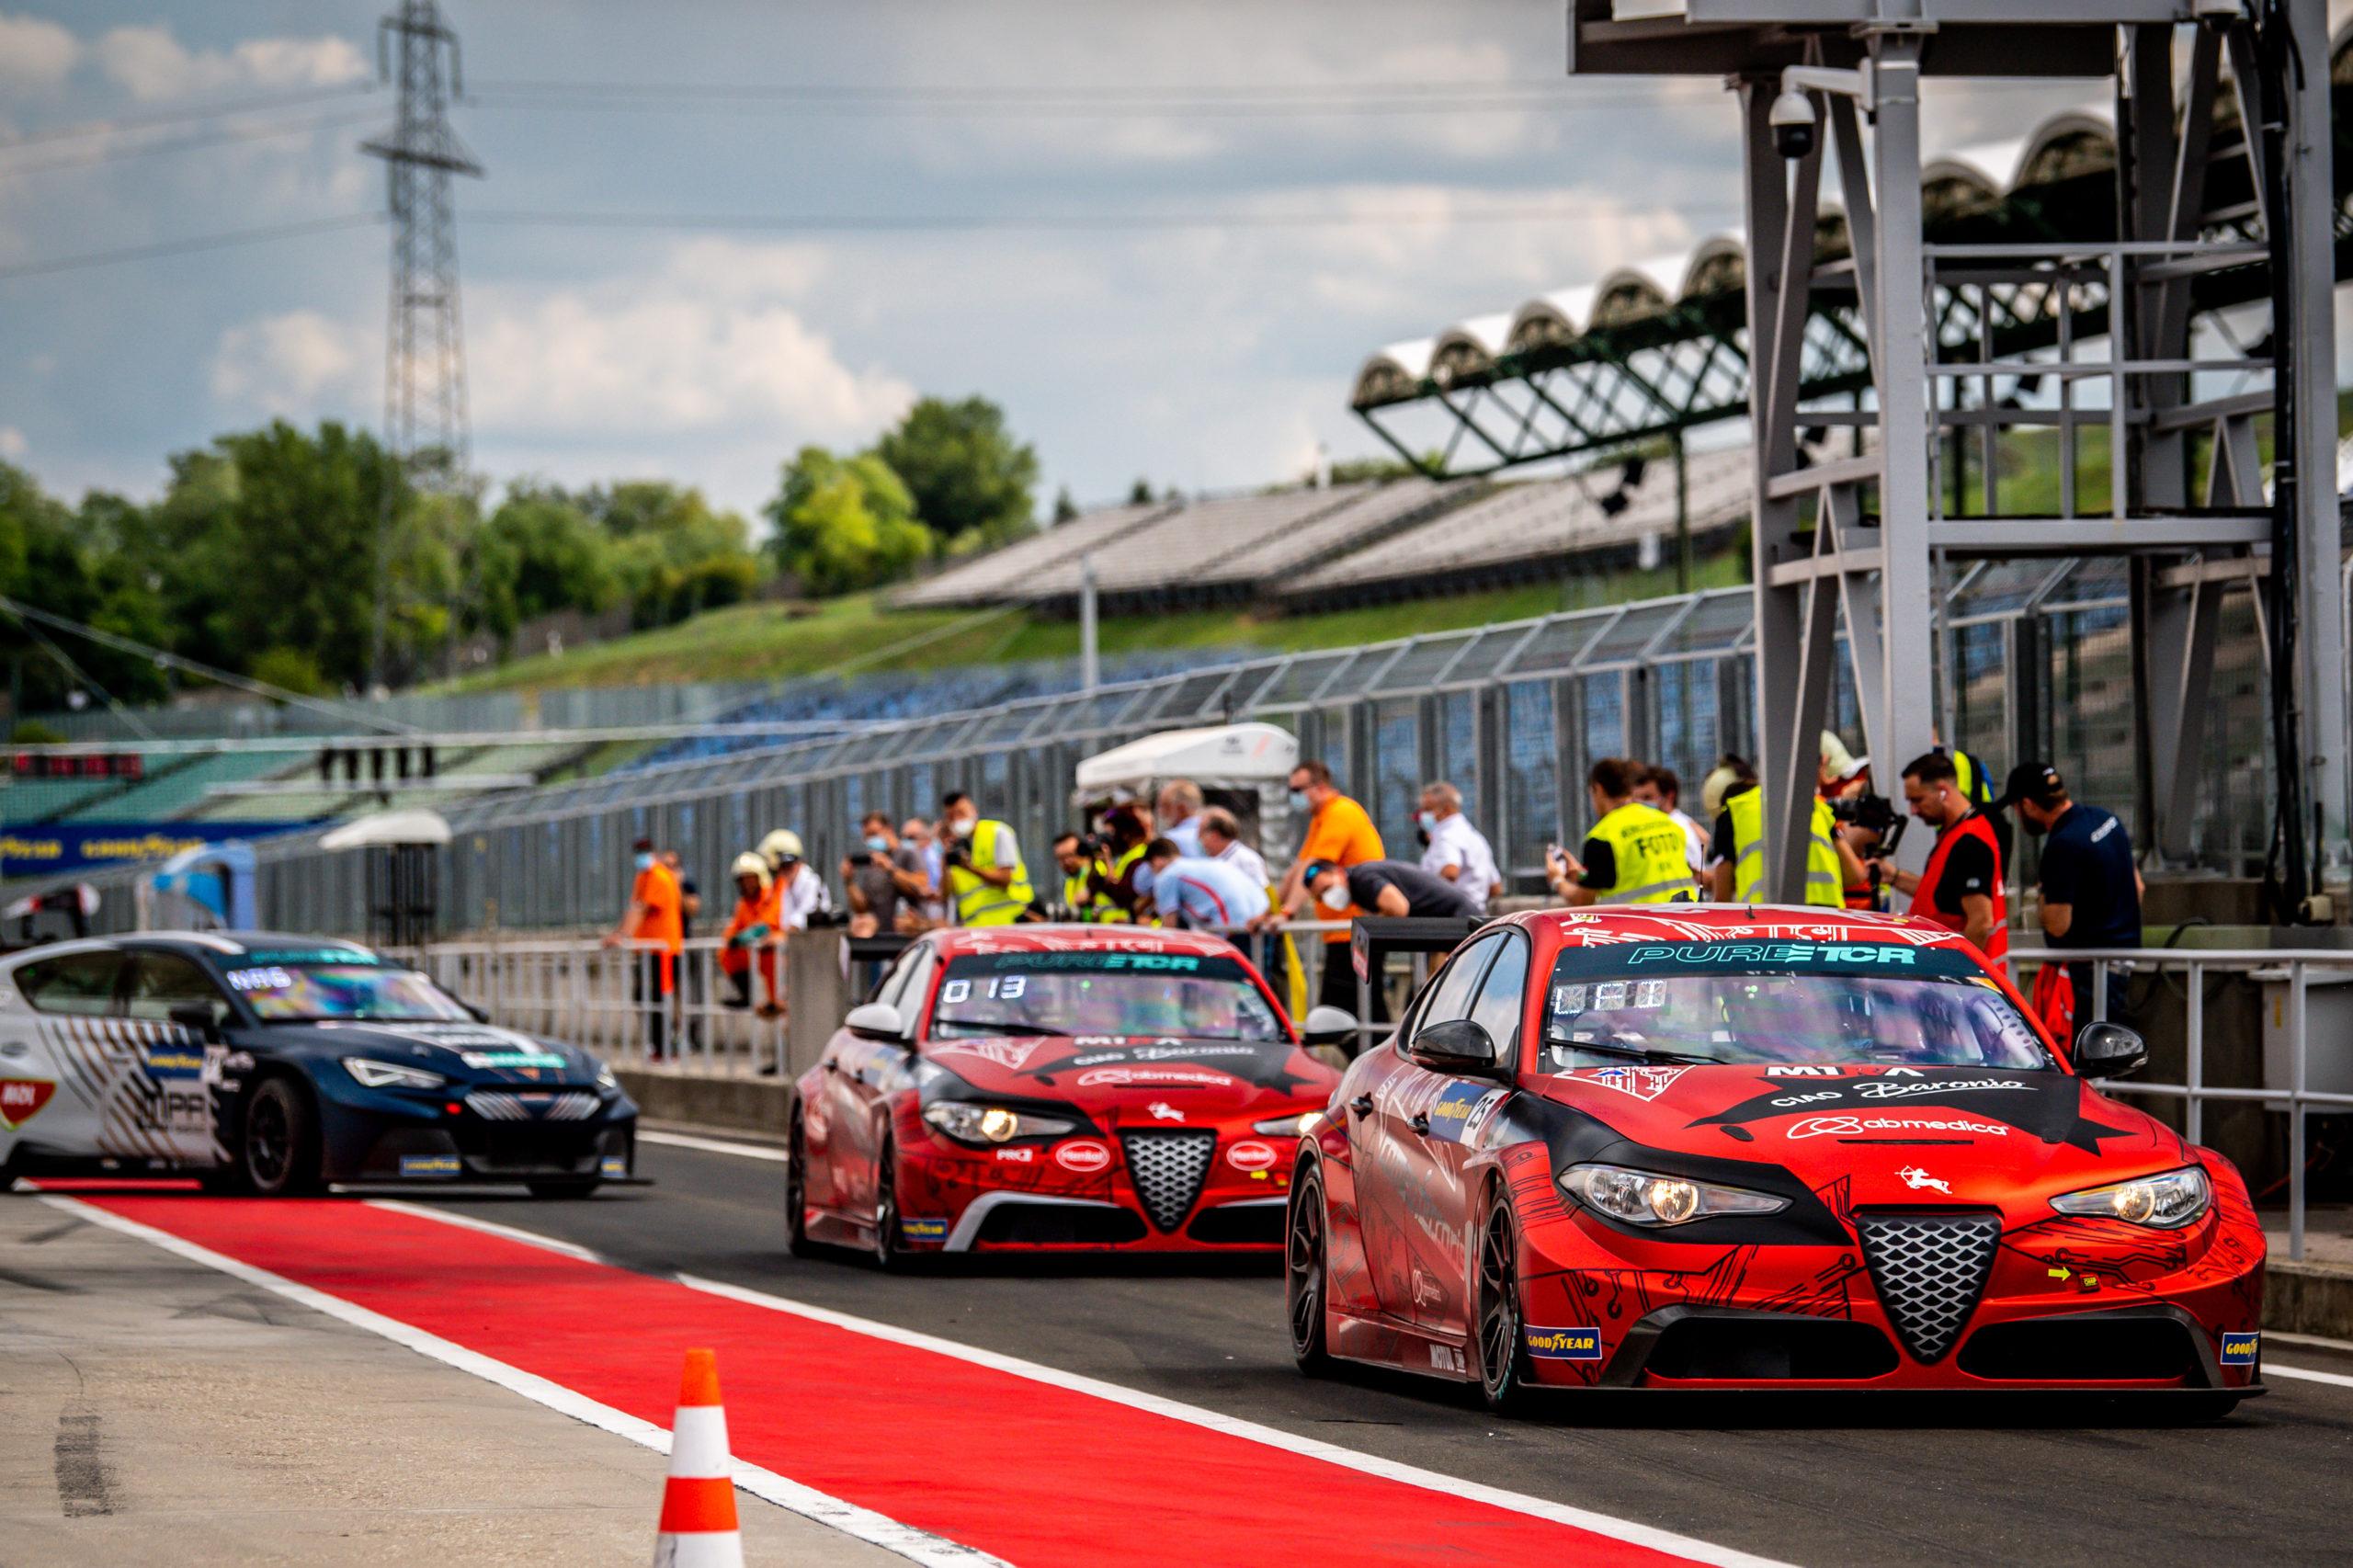 Romeo Ferraris - Libres - Hungría - 2021 - PURE ETCR